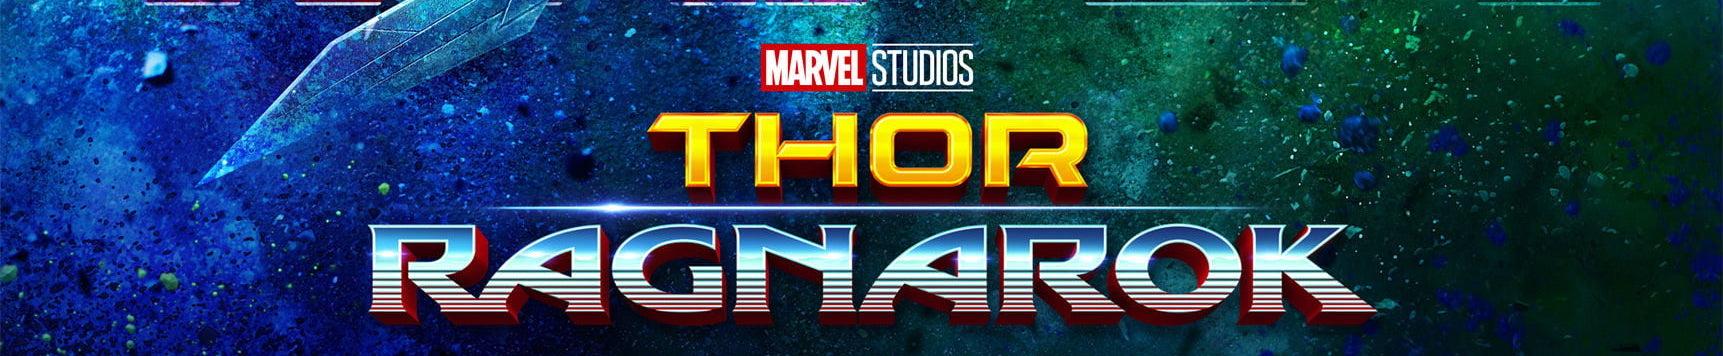 Thor: Ragnarok Recension GGG+ (inkl video)